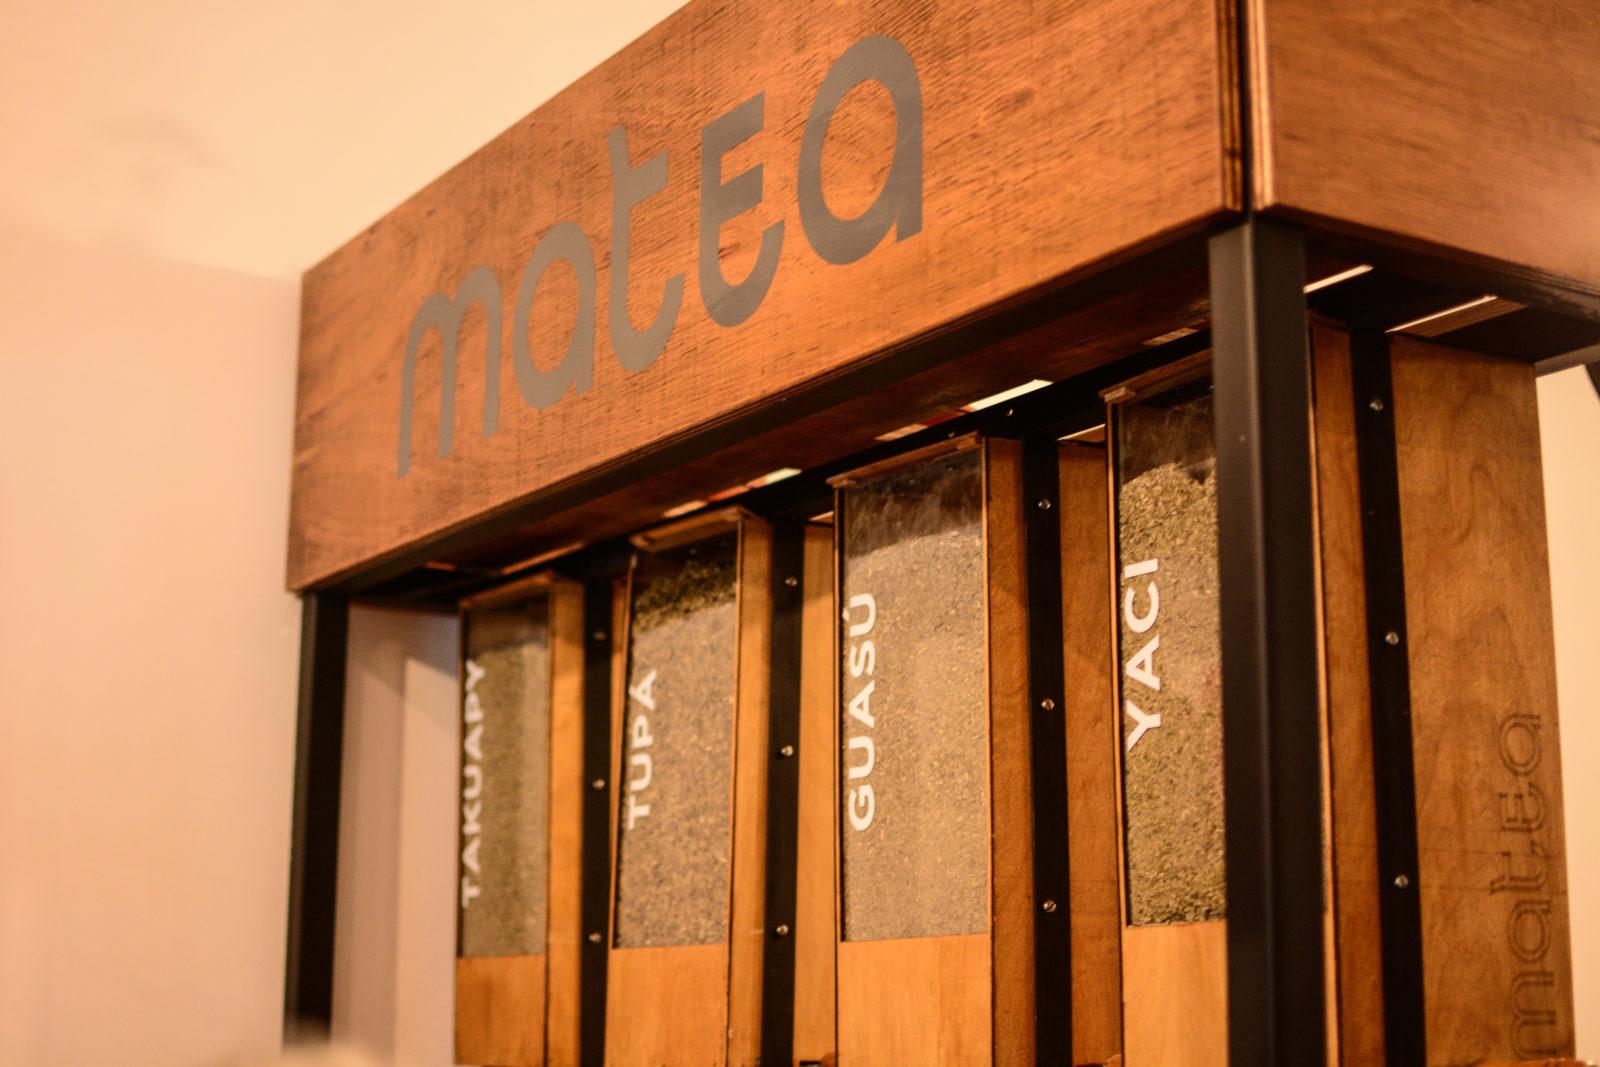 1 17 1600x1067 - Argentina: Se inauguró el primer Mate Bar Boutique en Latinoamérica